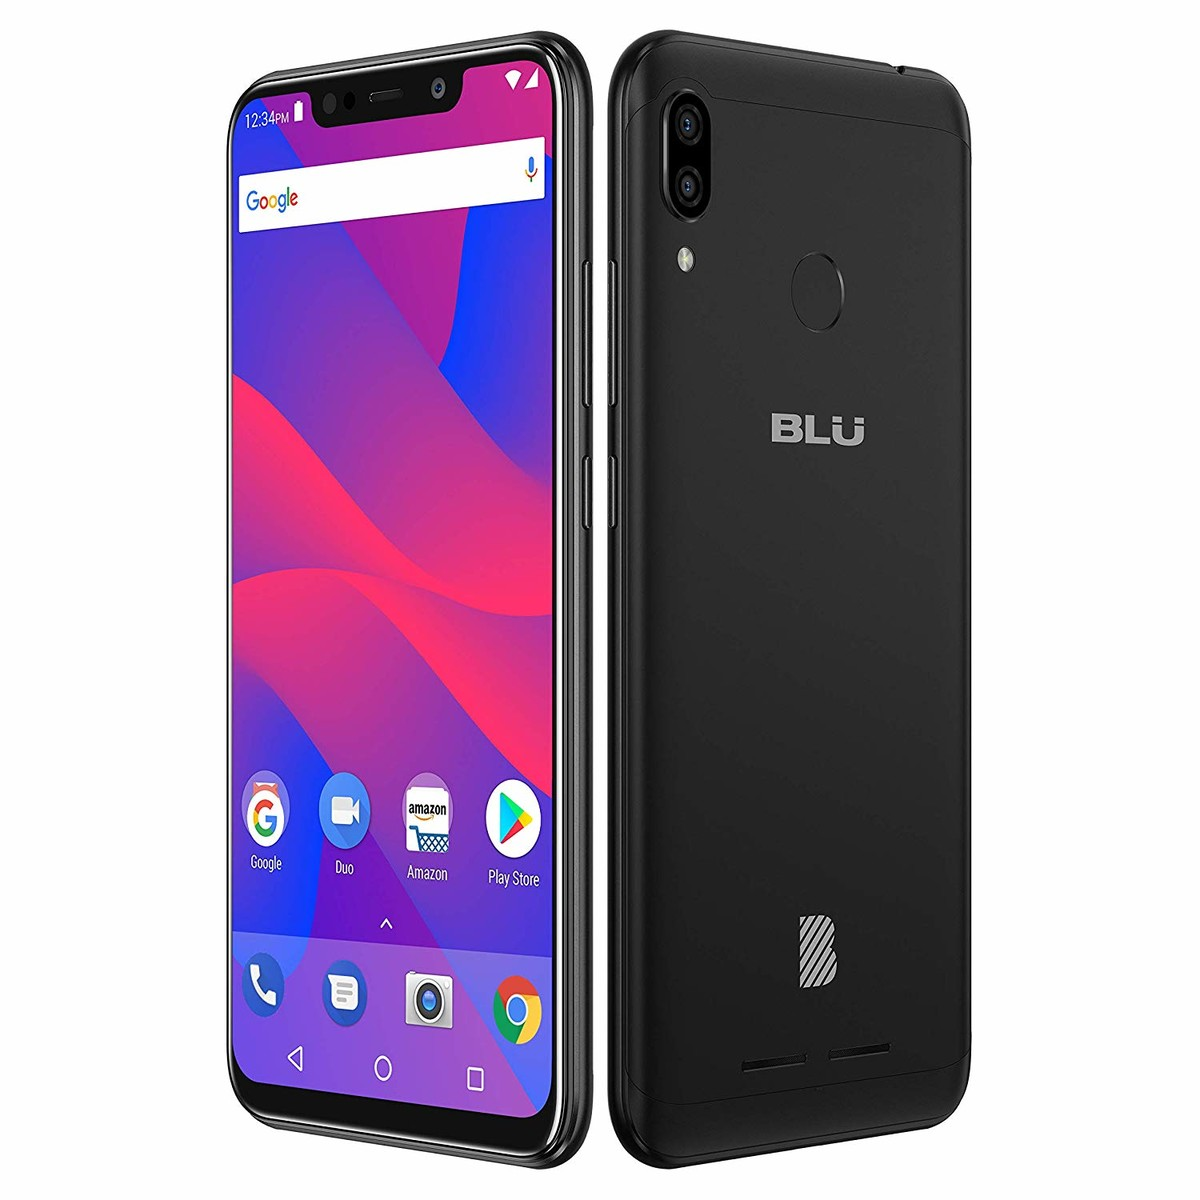 eb78dba64 The BLU Vivo XL4 offers decent mid-range performance at a reasonable price.  (Source  Amazon)